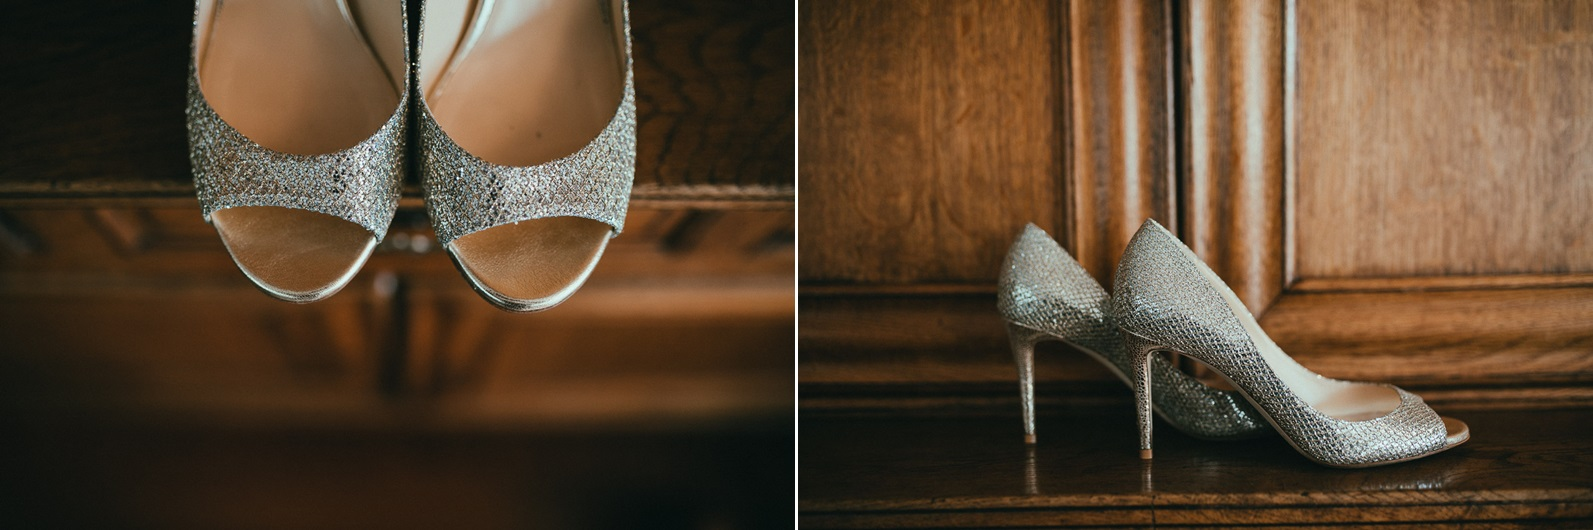 chateau-wedding-photography (17).jpg